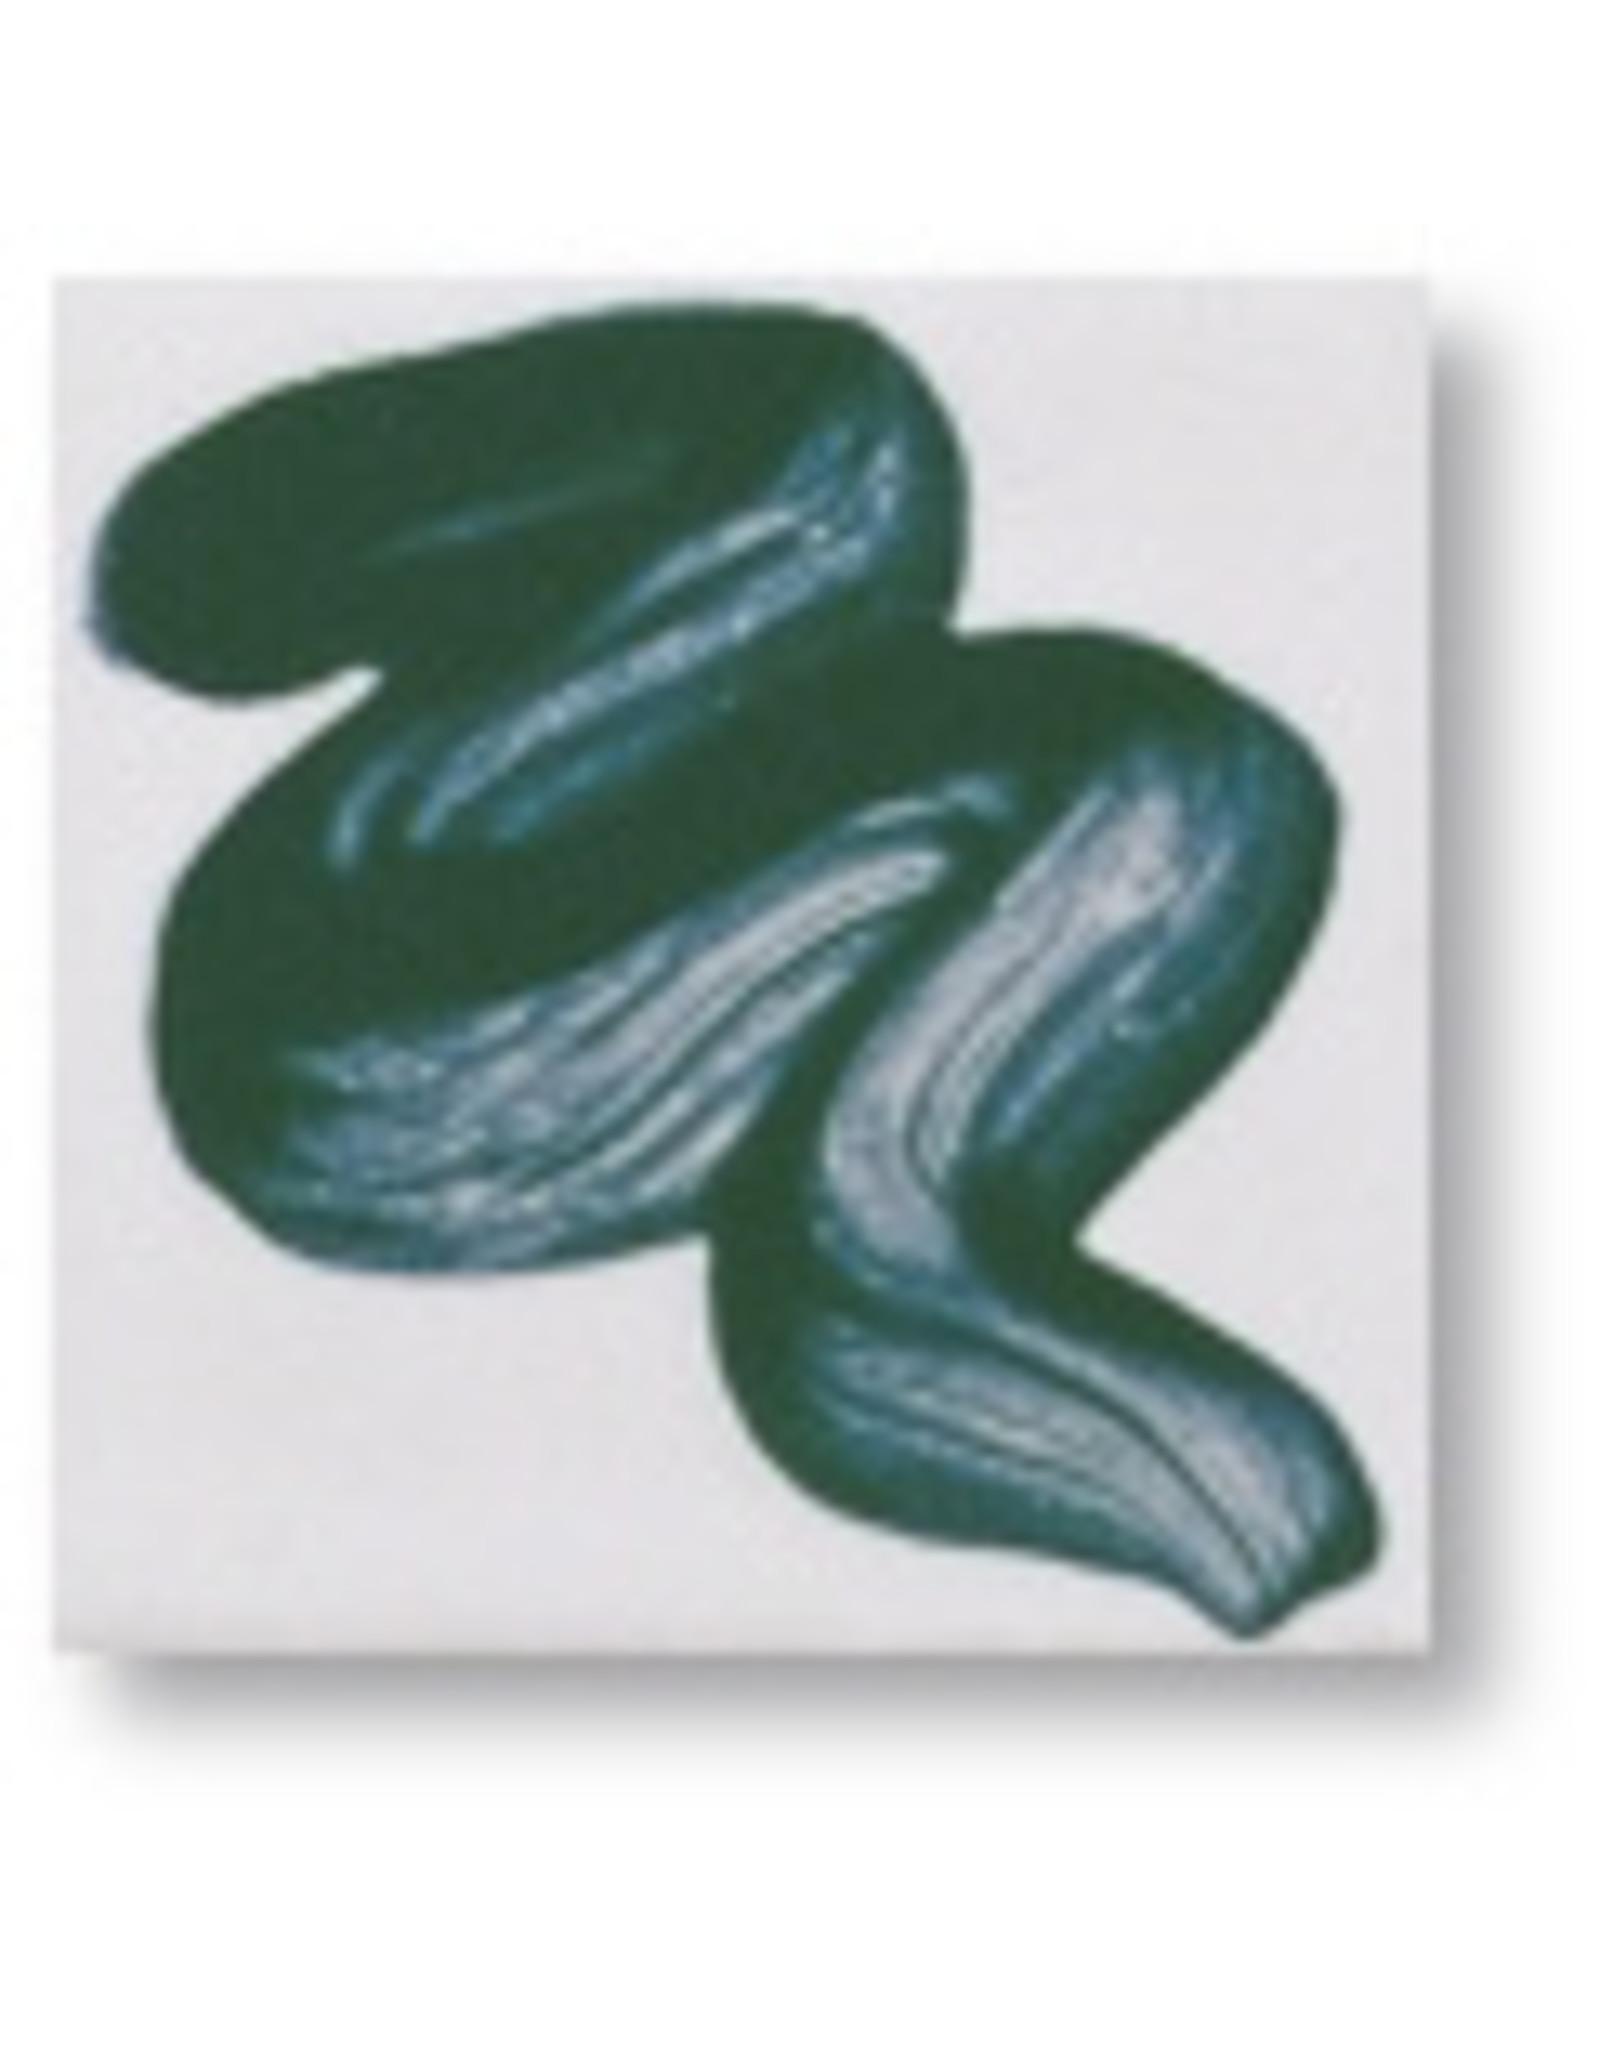 Botz Unidekor Blue Green 30ml